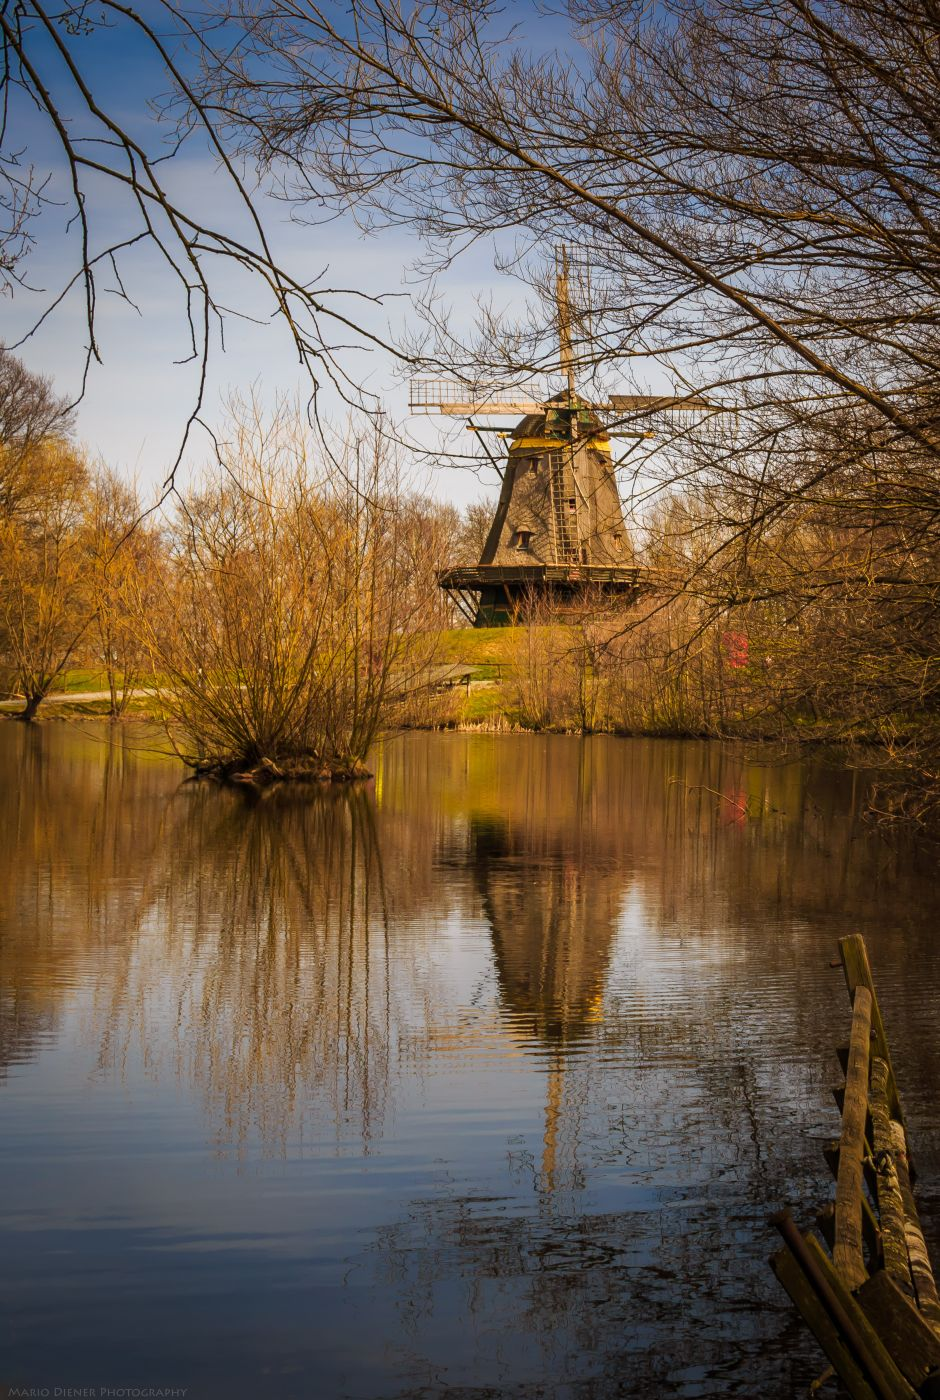 Hessenpark, Germany